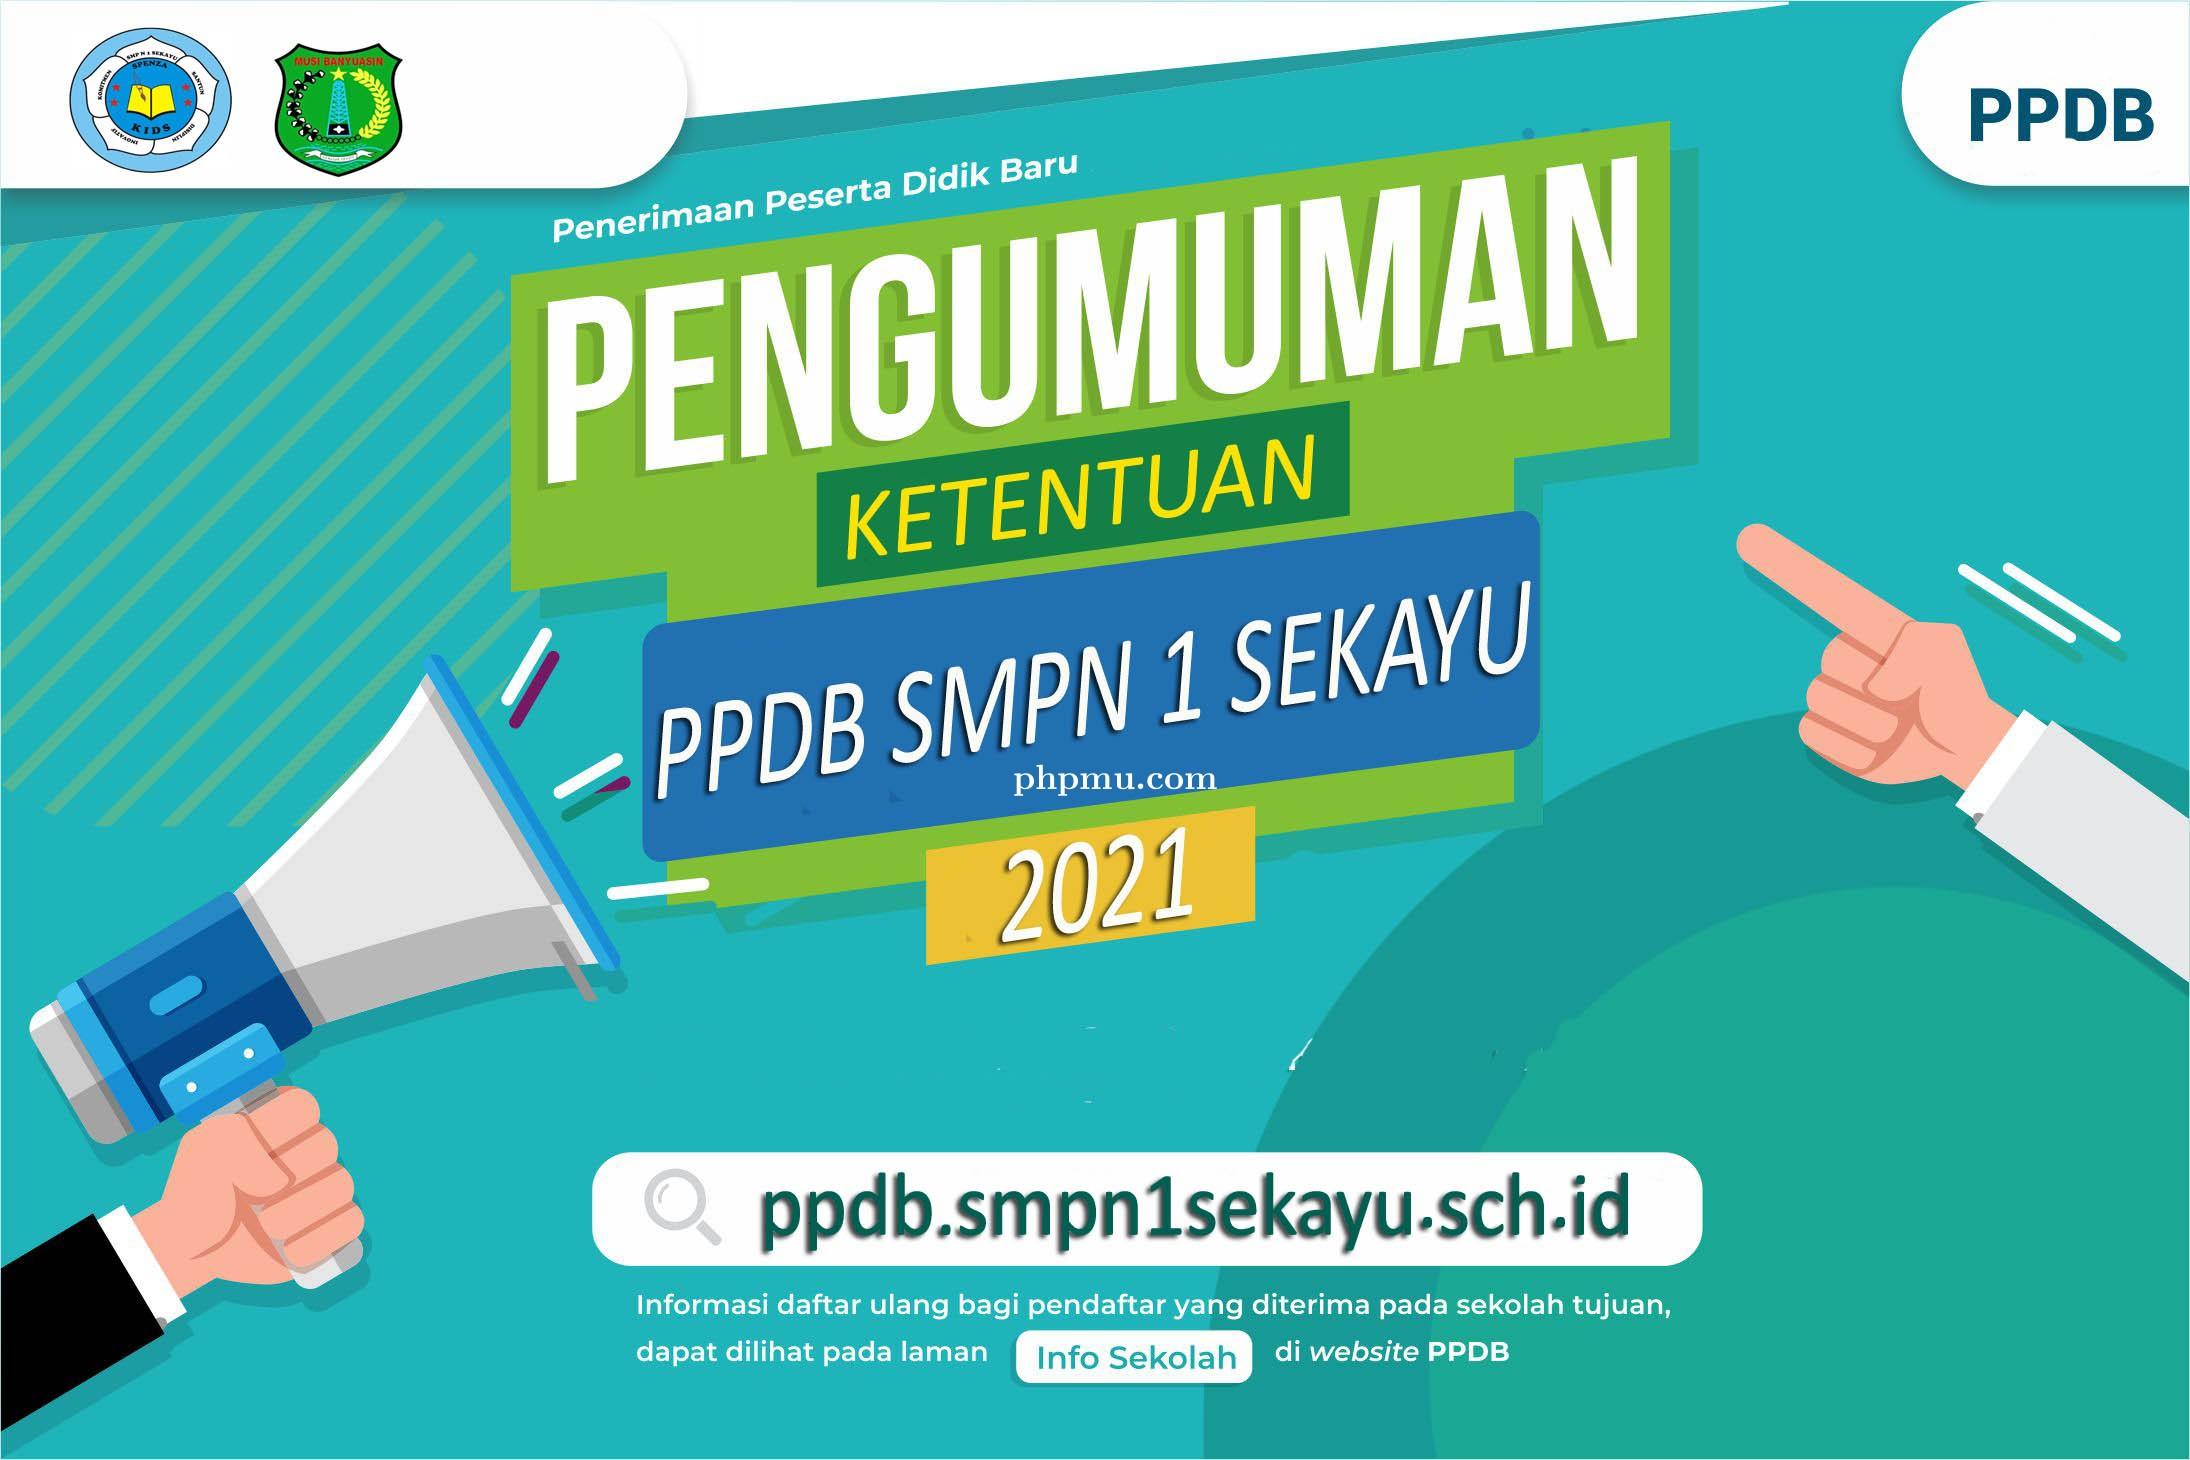 Ketentuan Penerimaan Peserta Didik Baru (PPDB) SMP Negeri 1 Sekayu Tahun Pelajaran 2021/2022